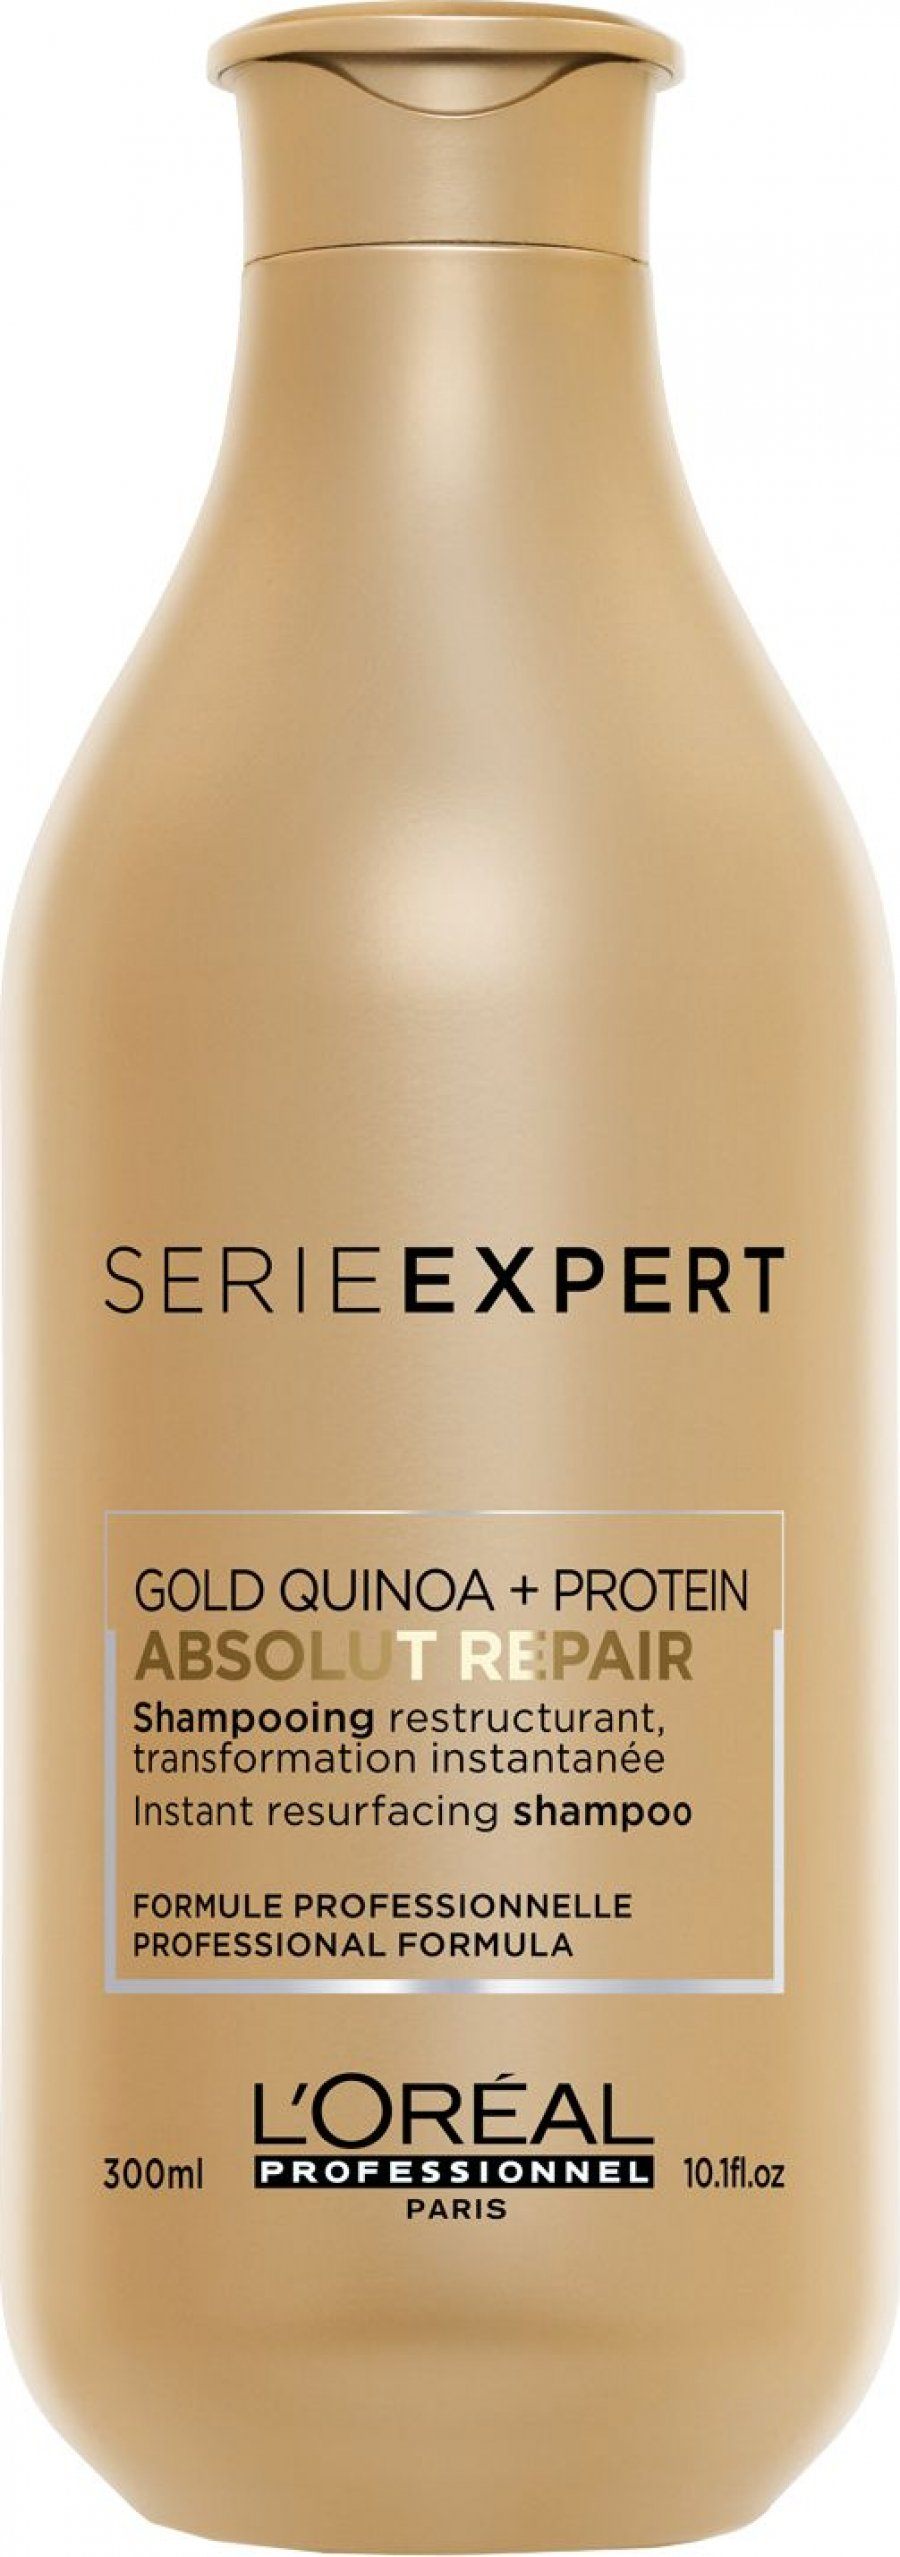 L'Oréal Professionnel - Golden Repair Shampoo 300 ml